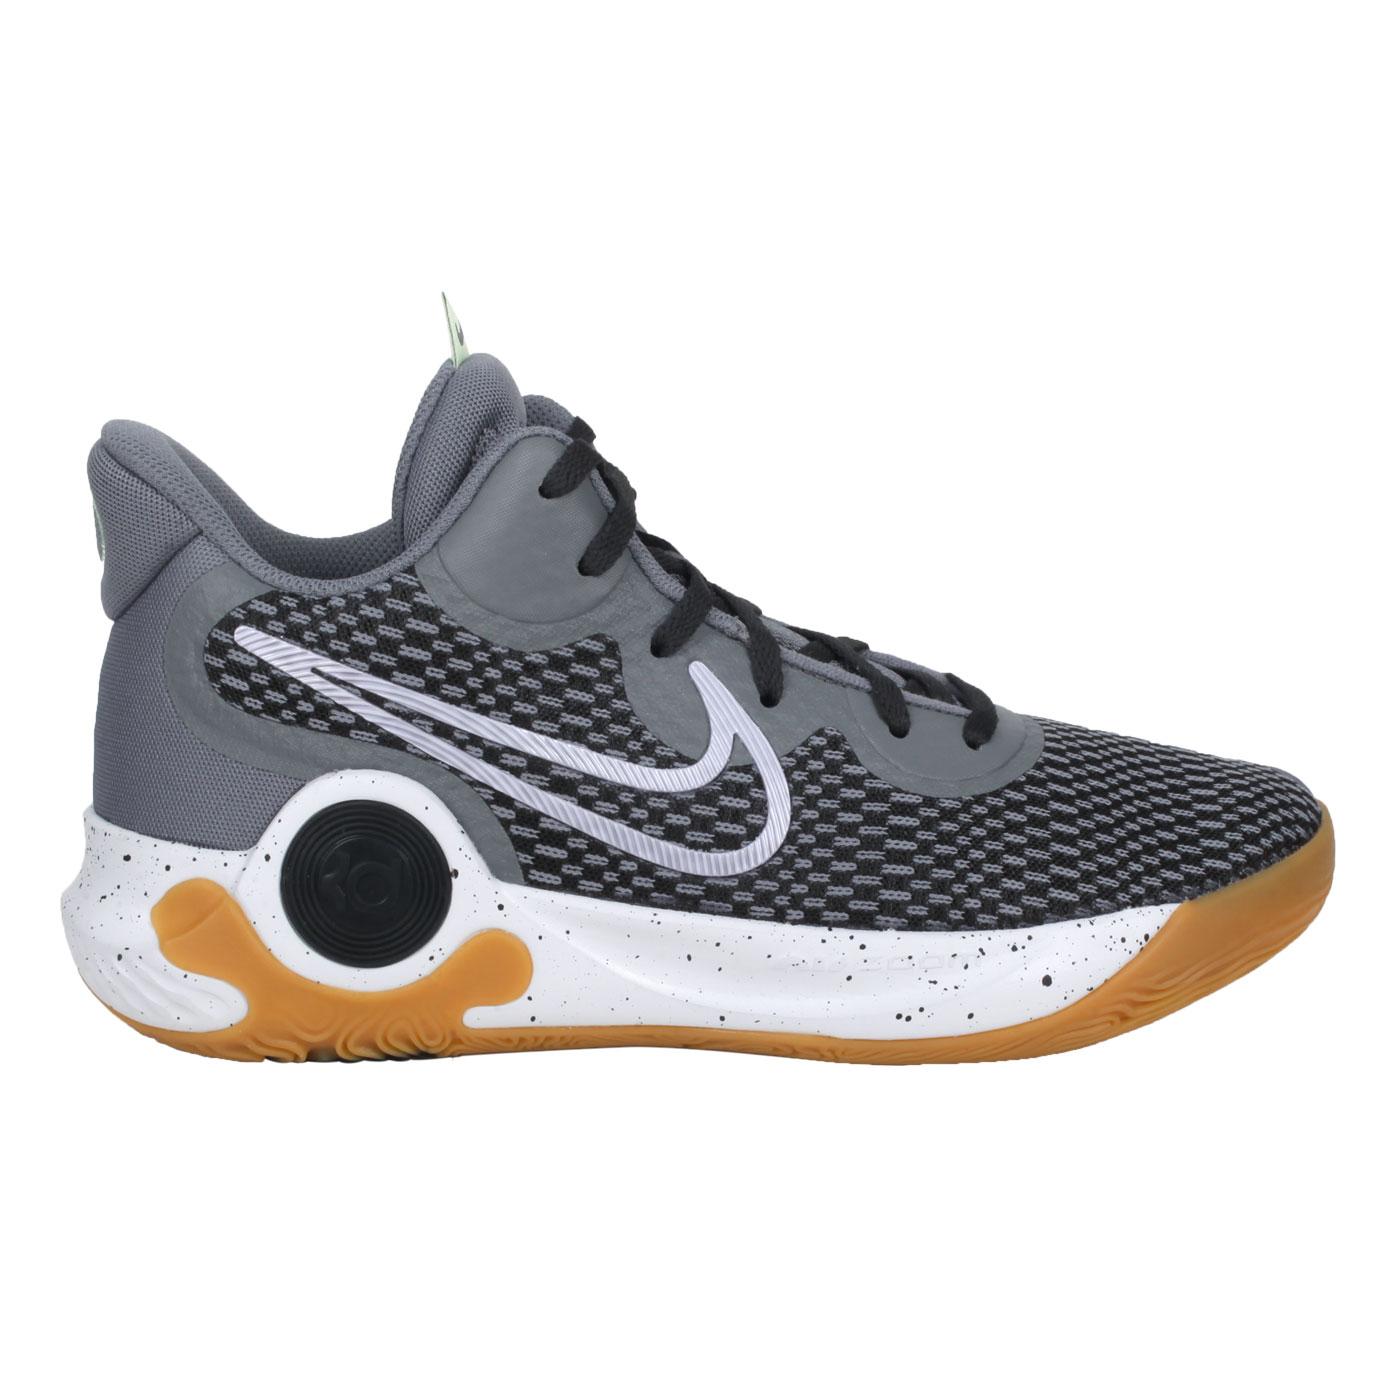 NIKE 男款籃球鞋@KD TREY 5 IX EP@ CW3402003 - 灰黑